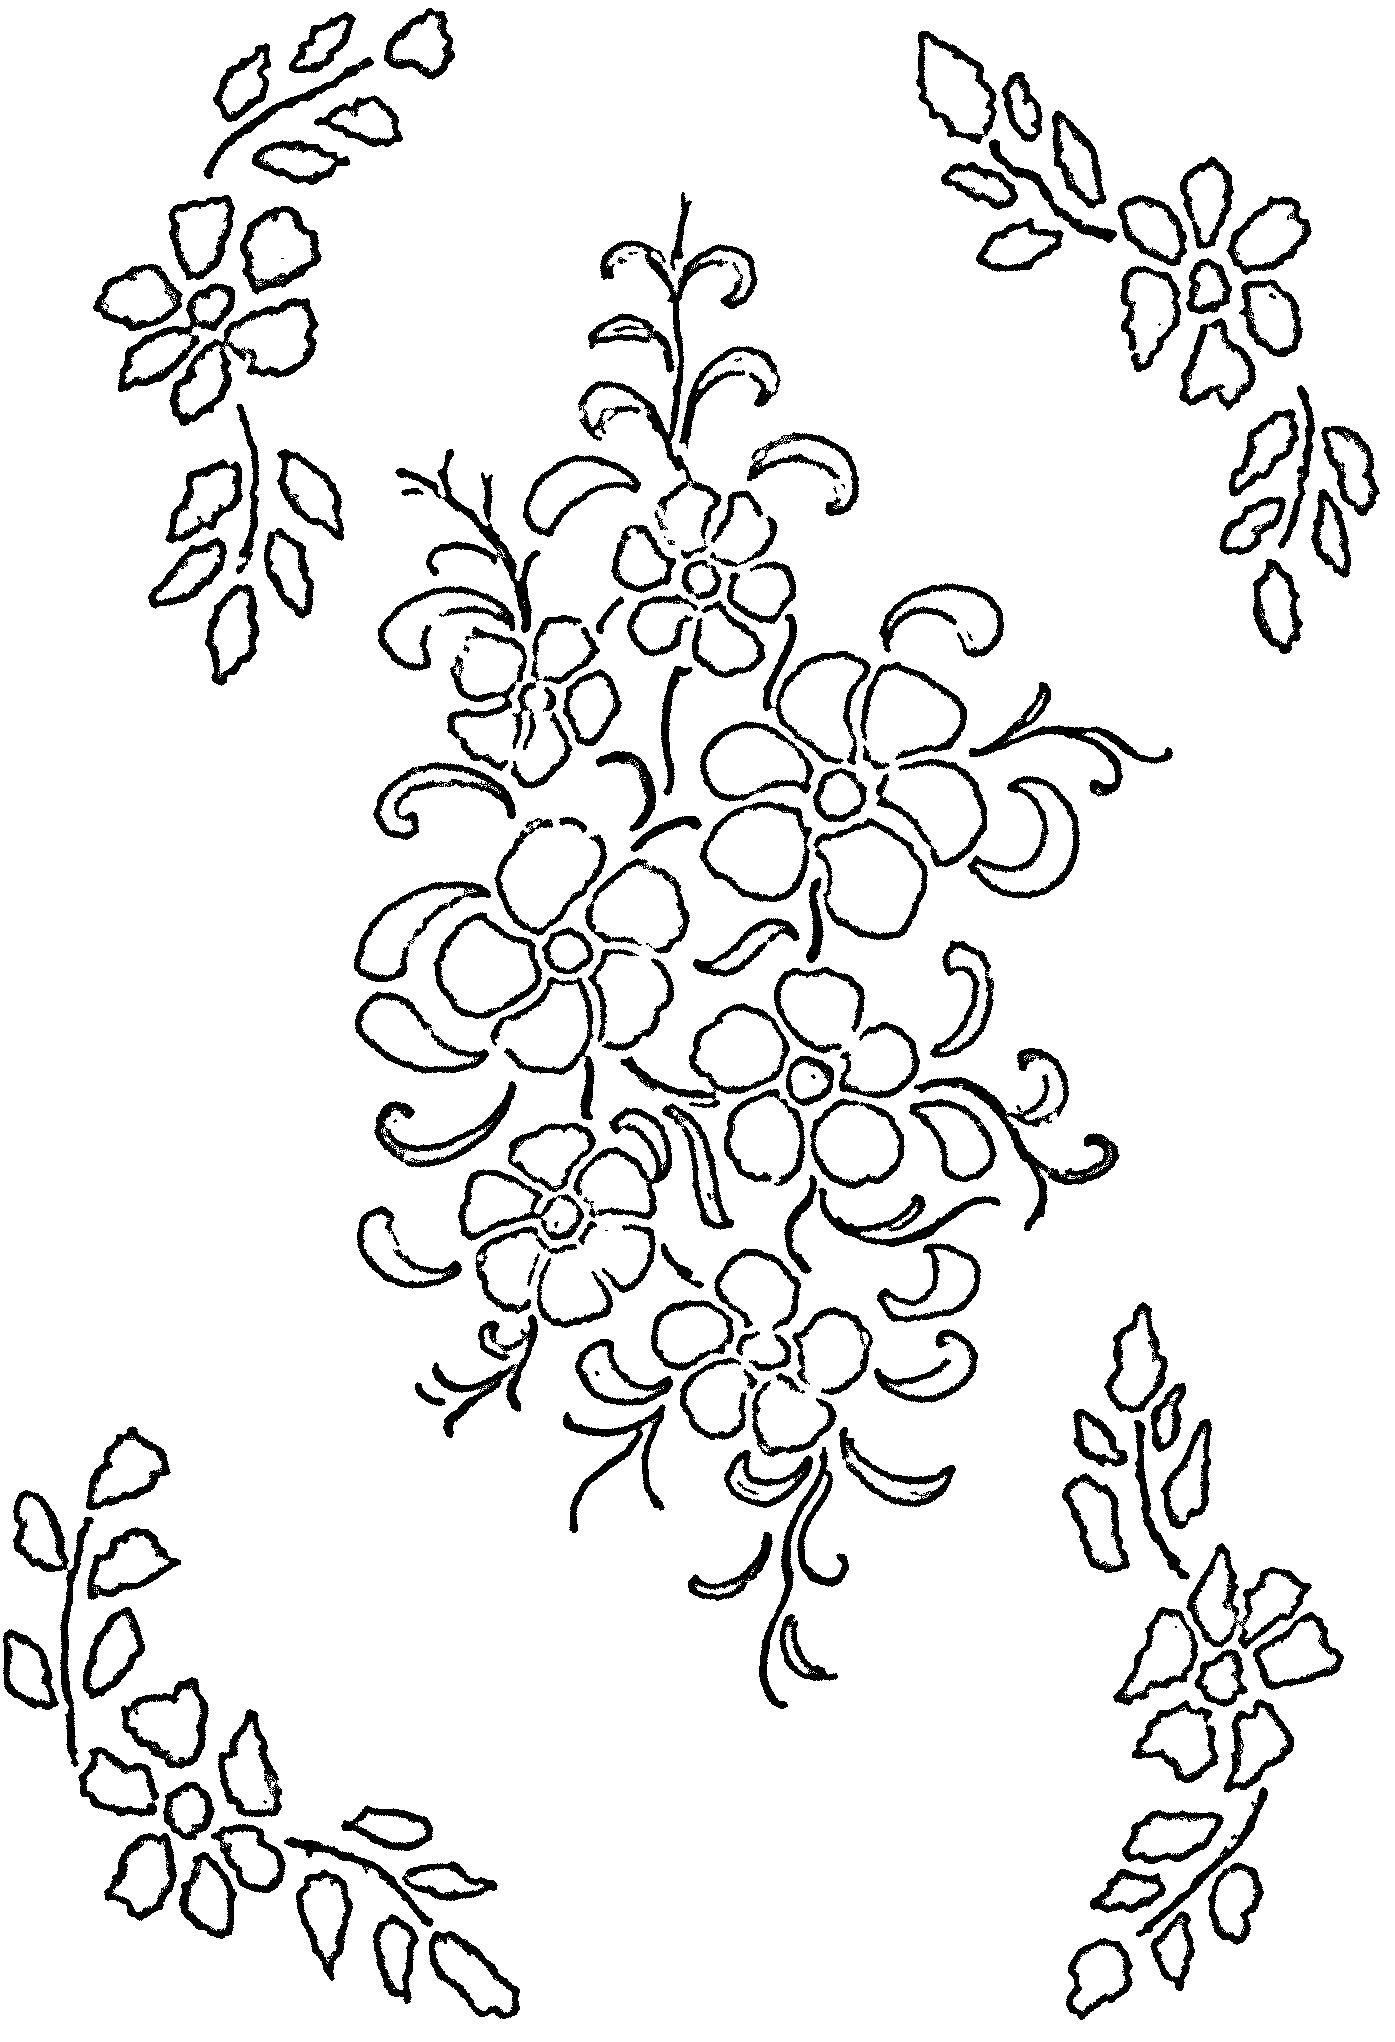 Free Printable Designs | Glass Painting Patterns - pattern design ...